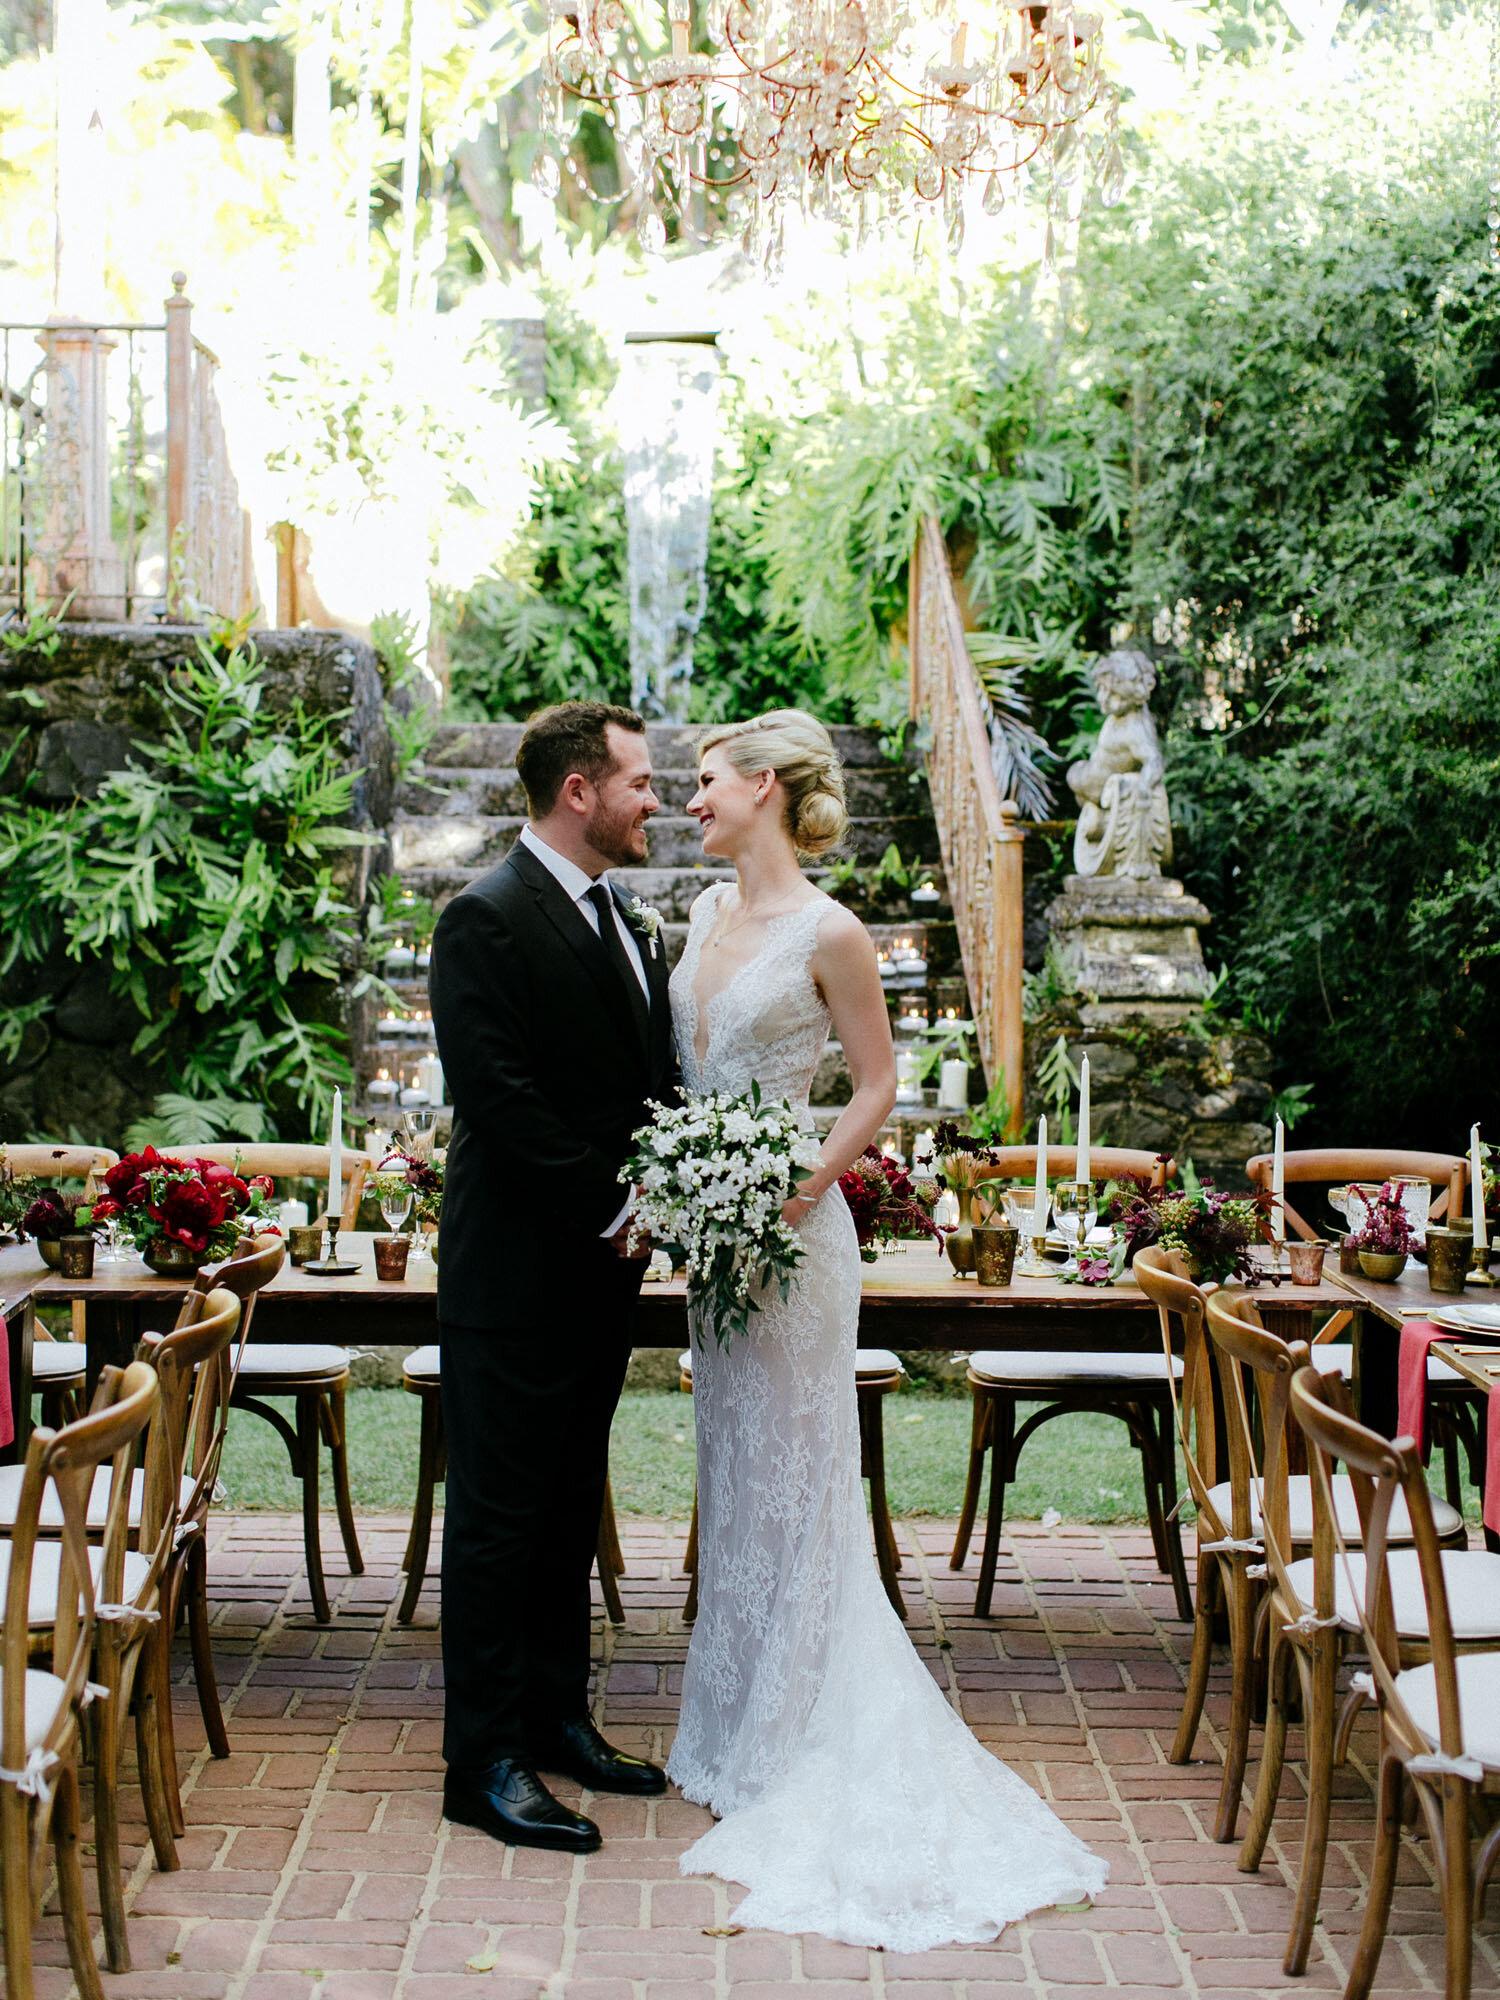 Chris-J-Evans-Maui-Wedding-Kim&Brian3517.jpg